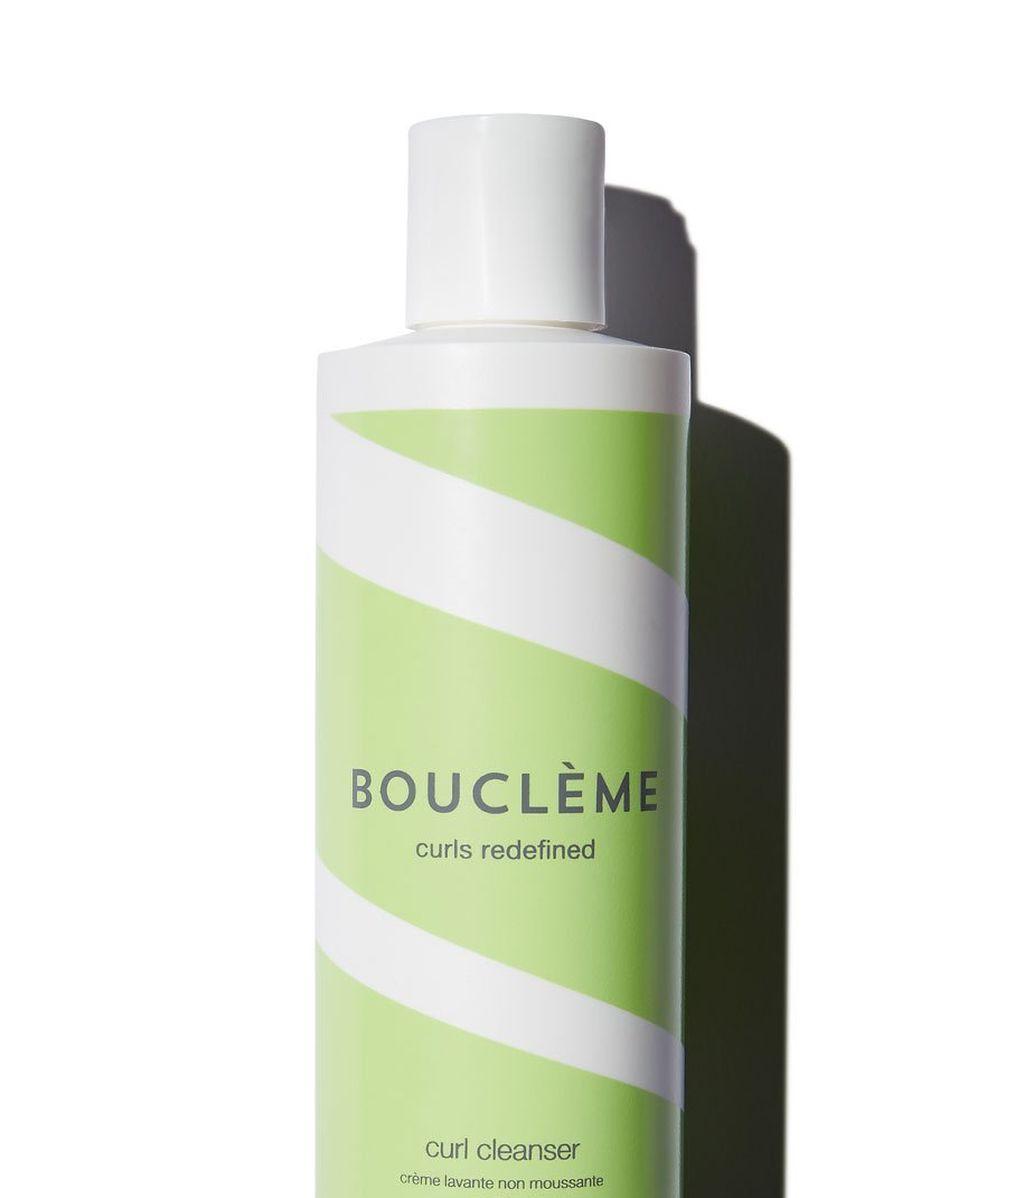 curlcleanser-BOUCLEME